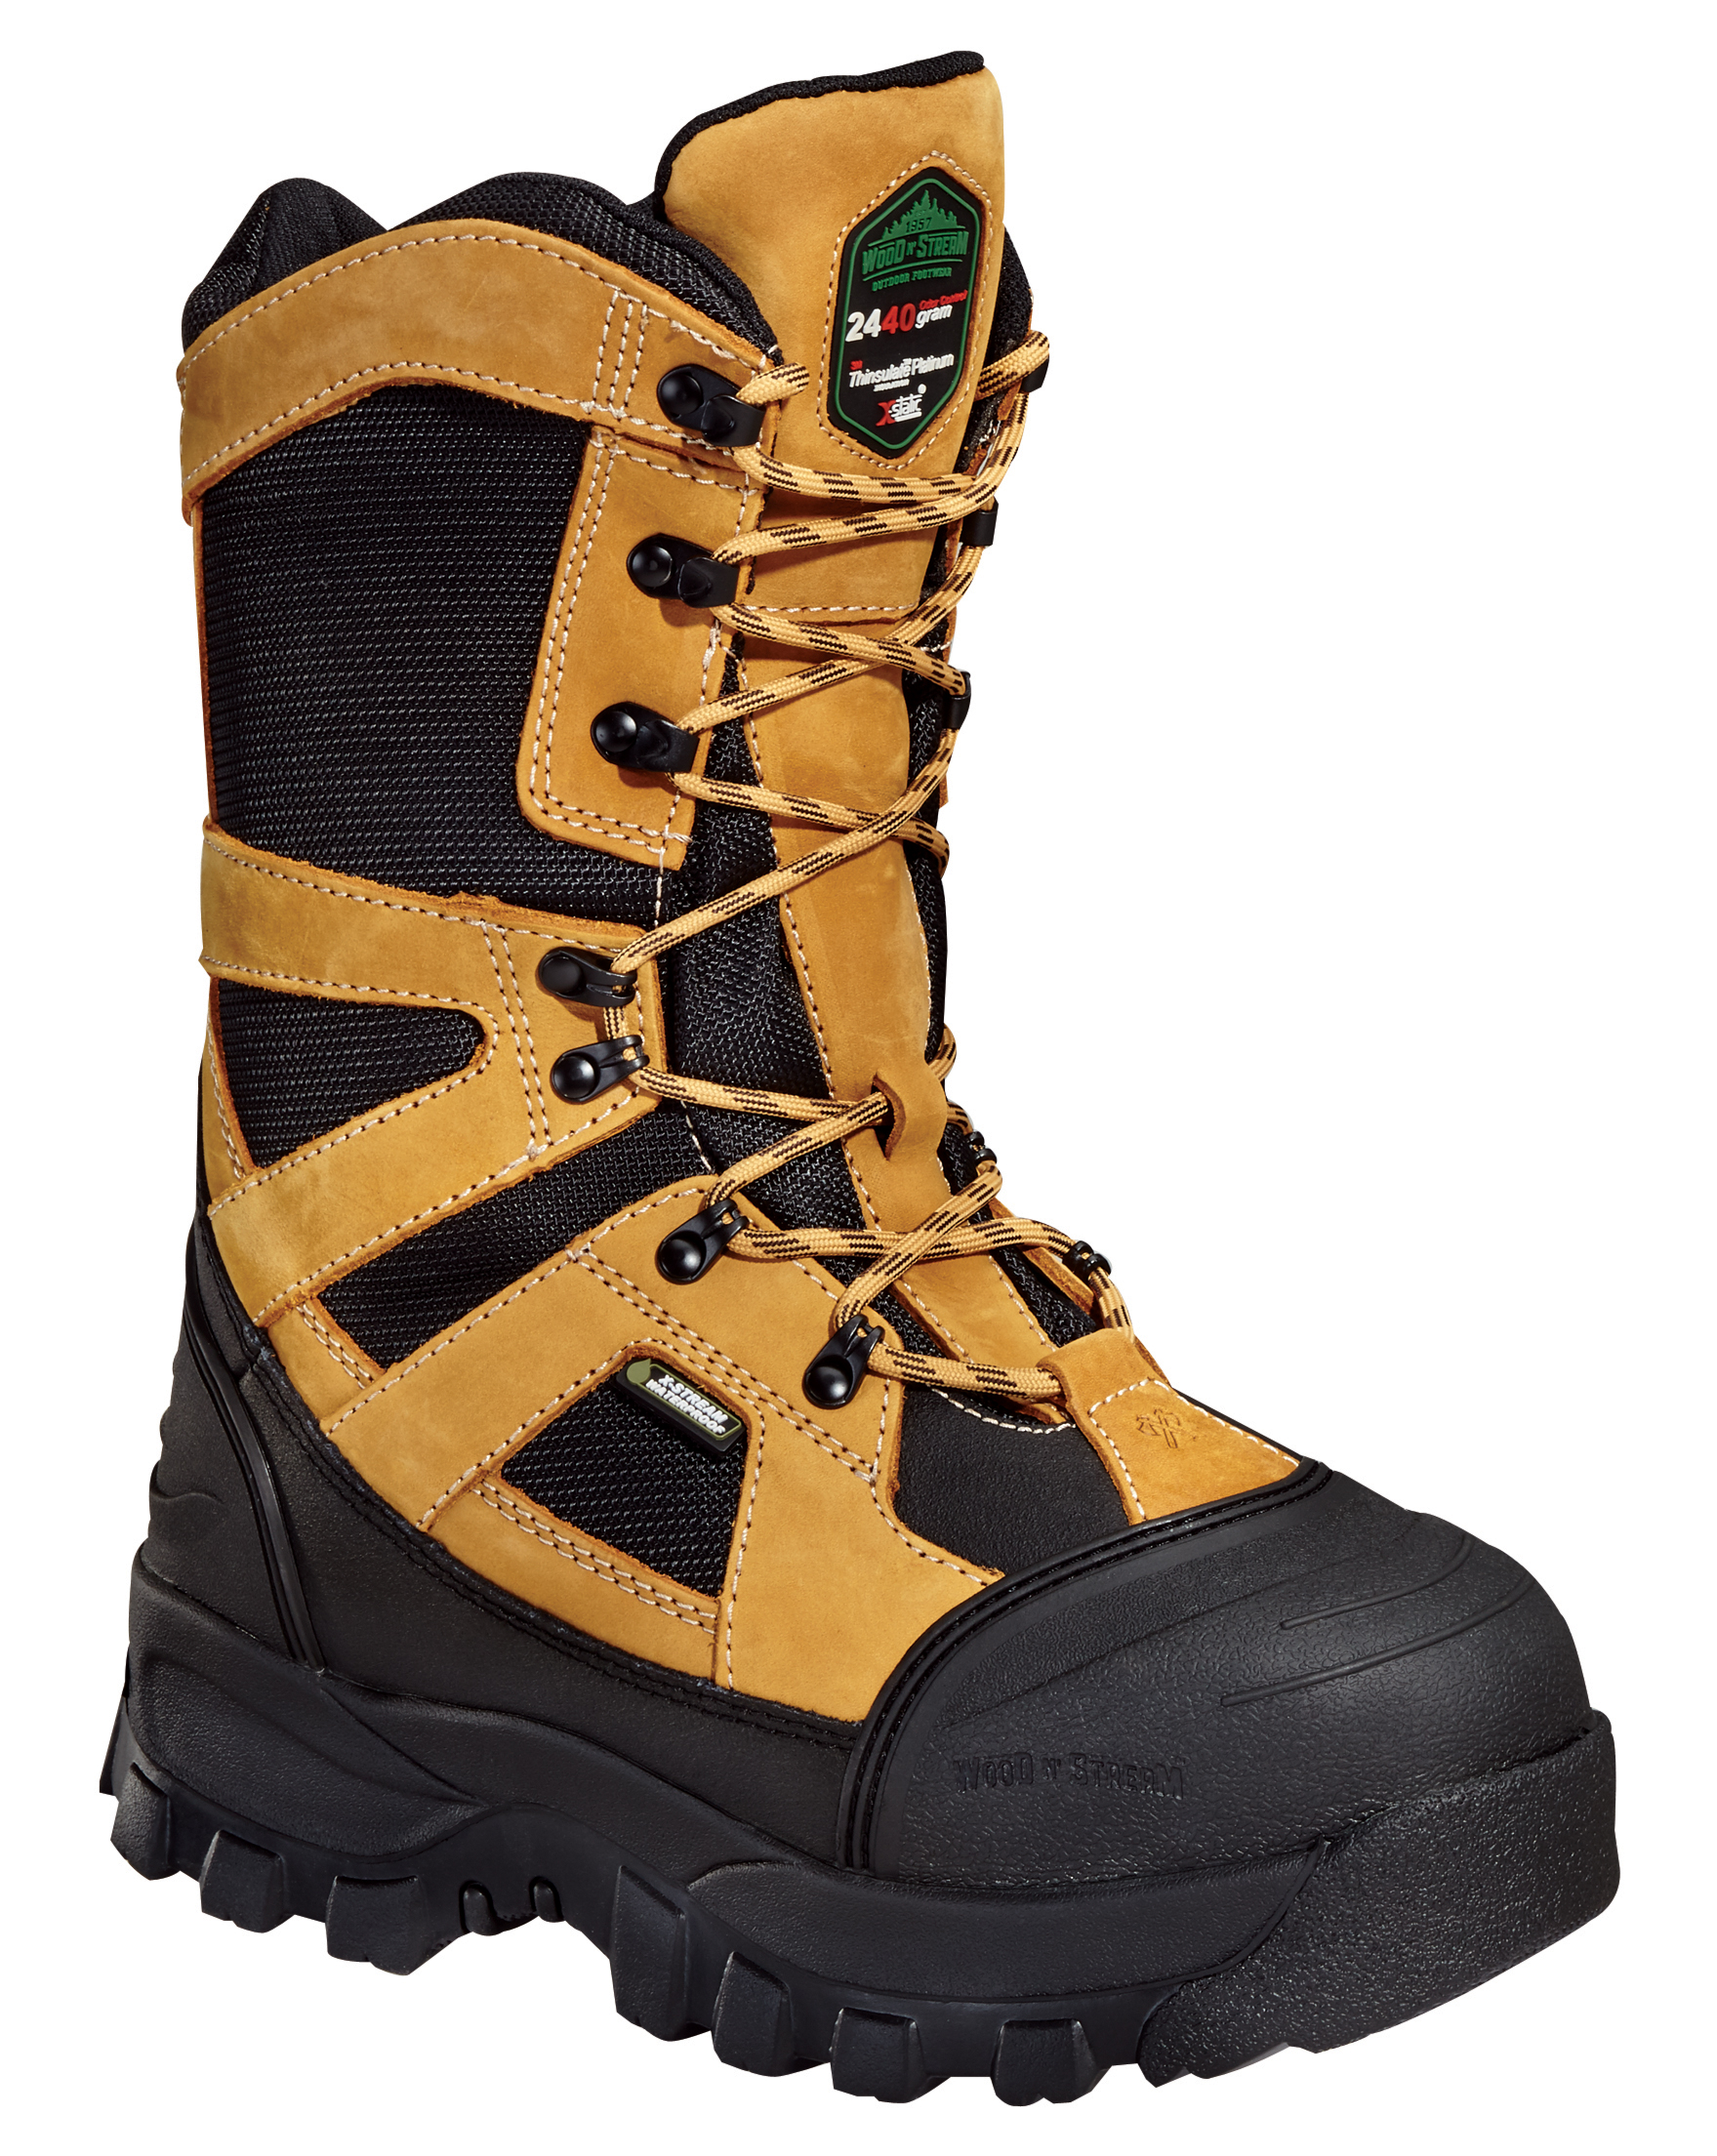 5464151c0aa Weinbrenner Shoe Company / Thorogood Shoes